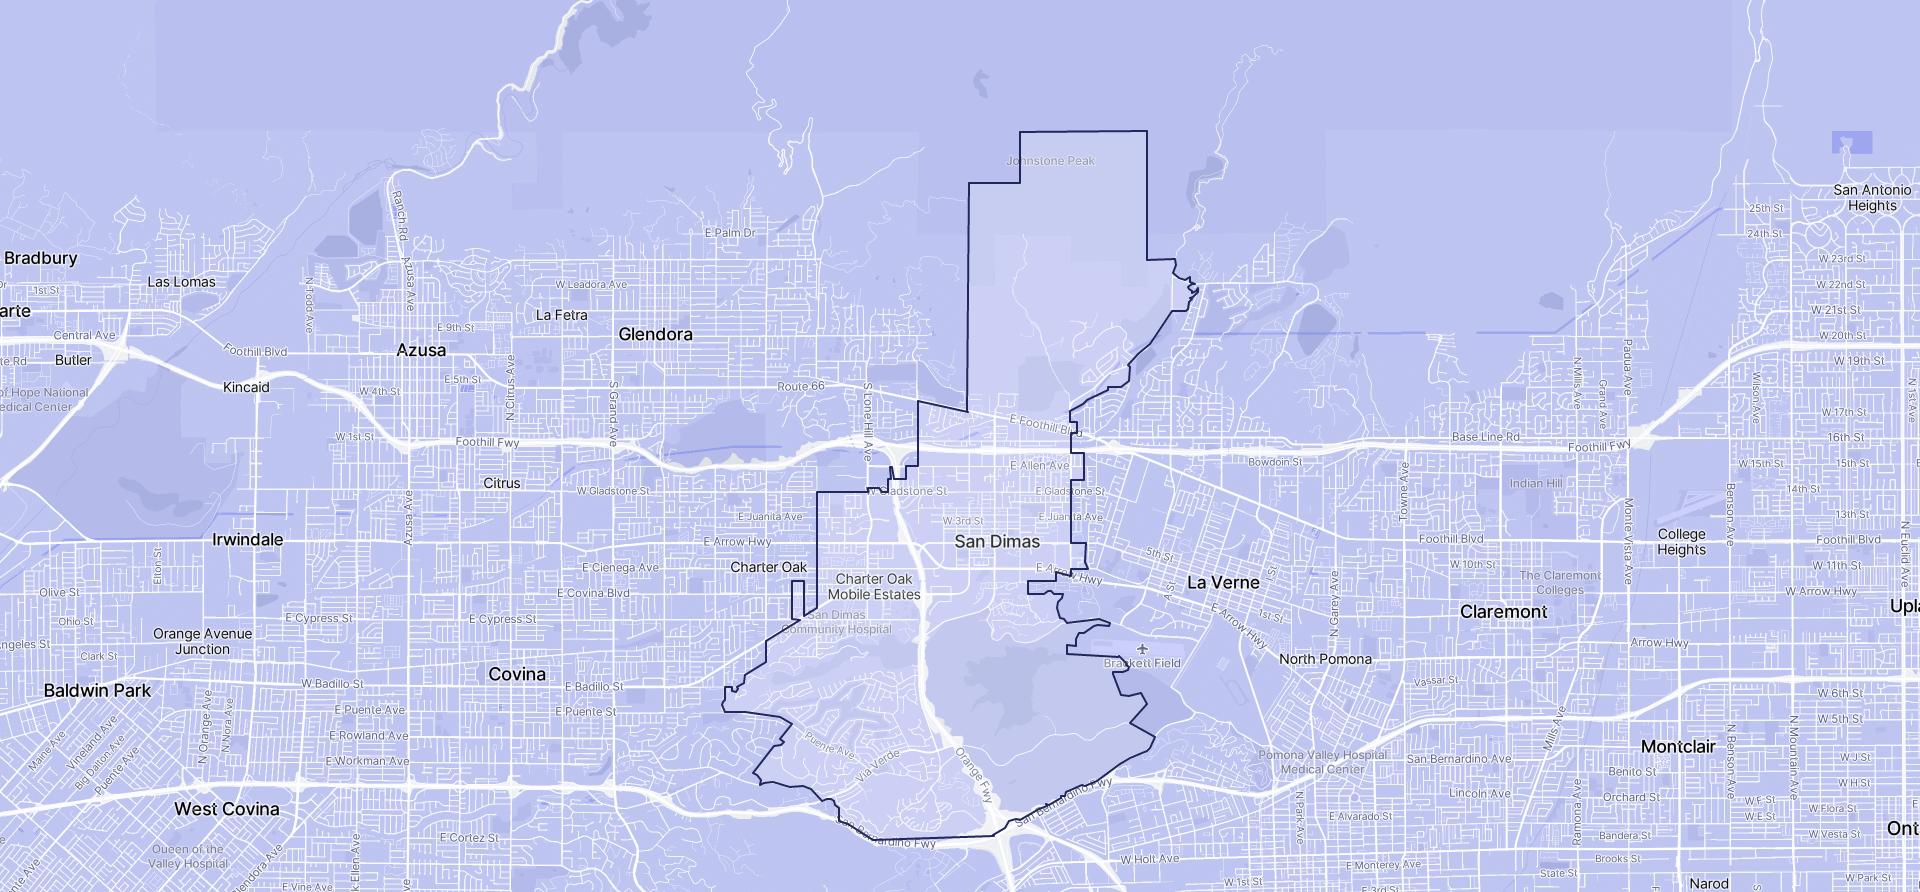 Image of San Dimas boundaries on a map.